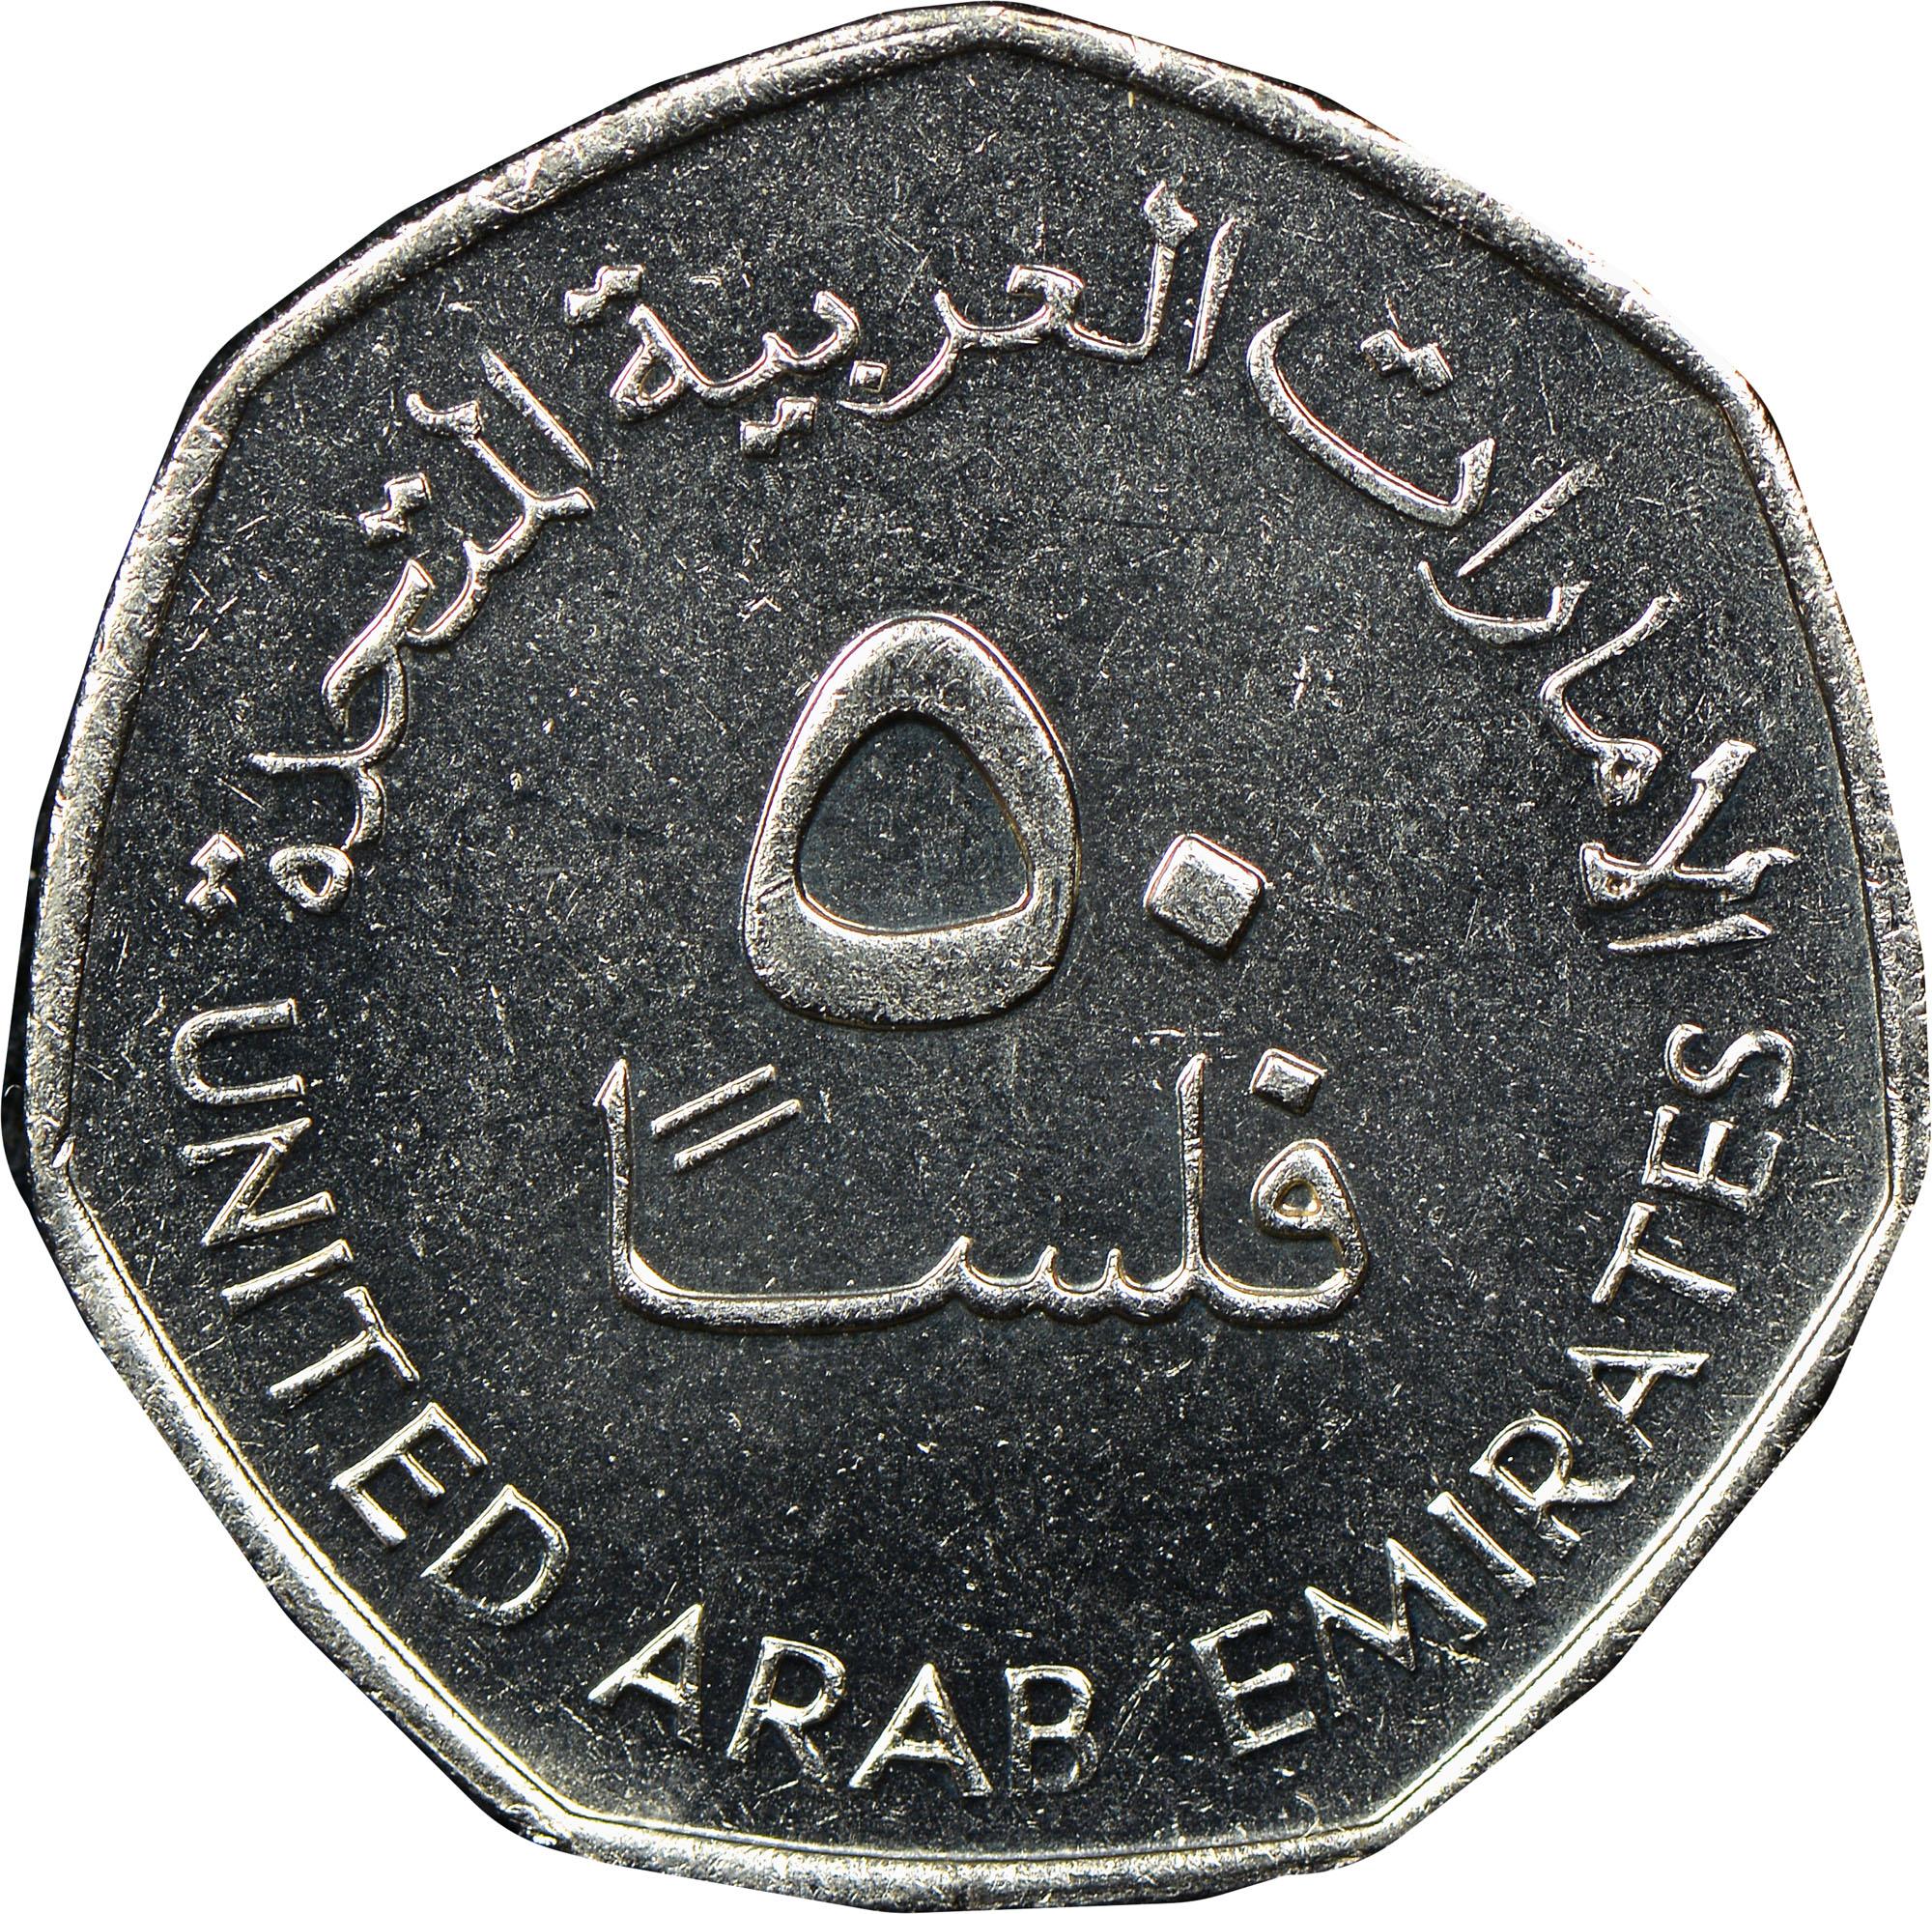 United Arab Emirates 50 Fils KM 16 Prices & Values | NGC